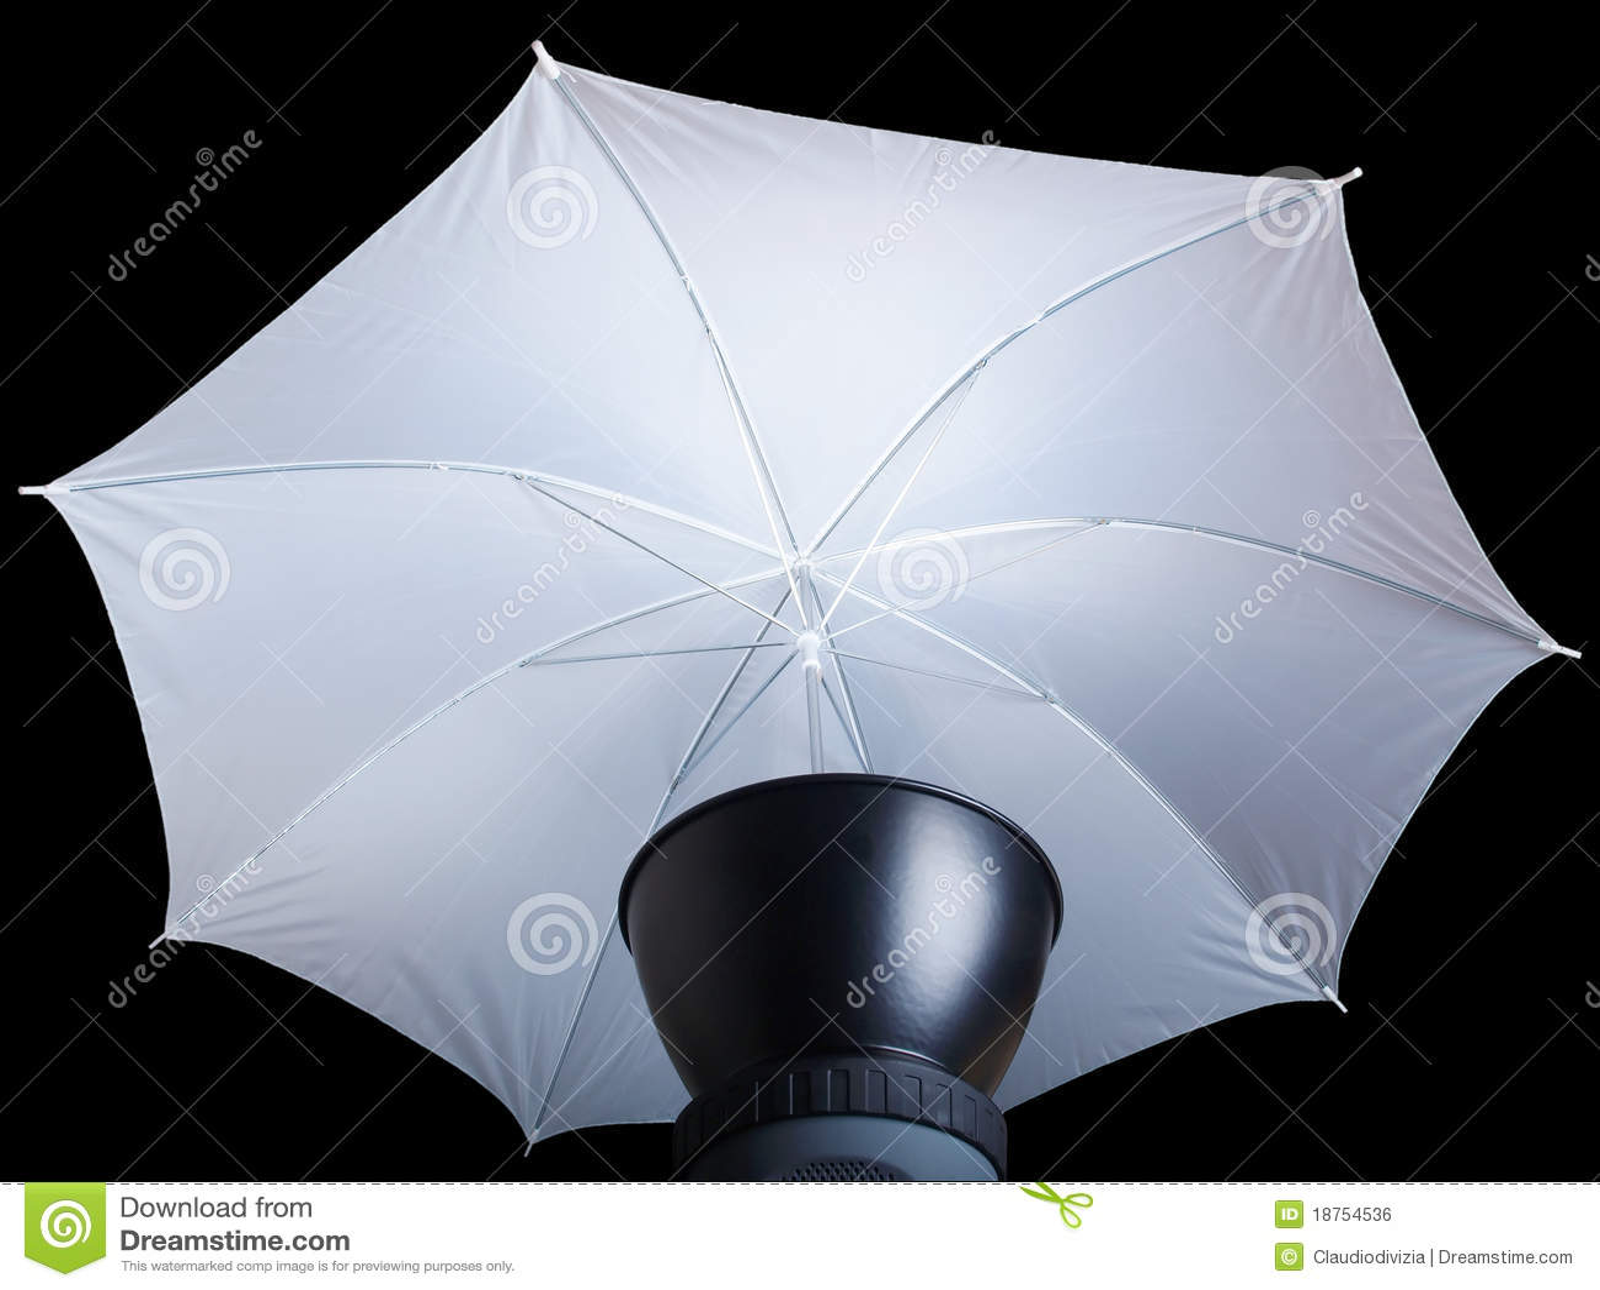 how to use studio umbrella lights